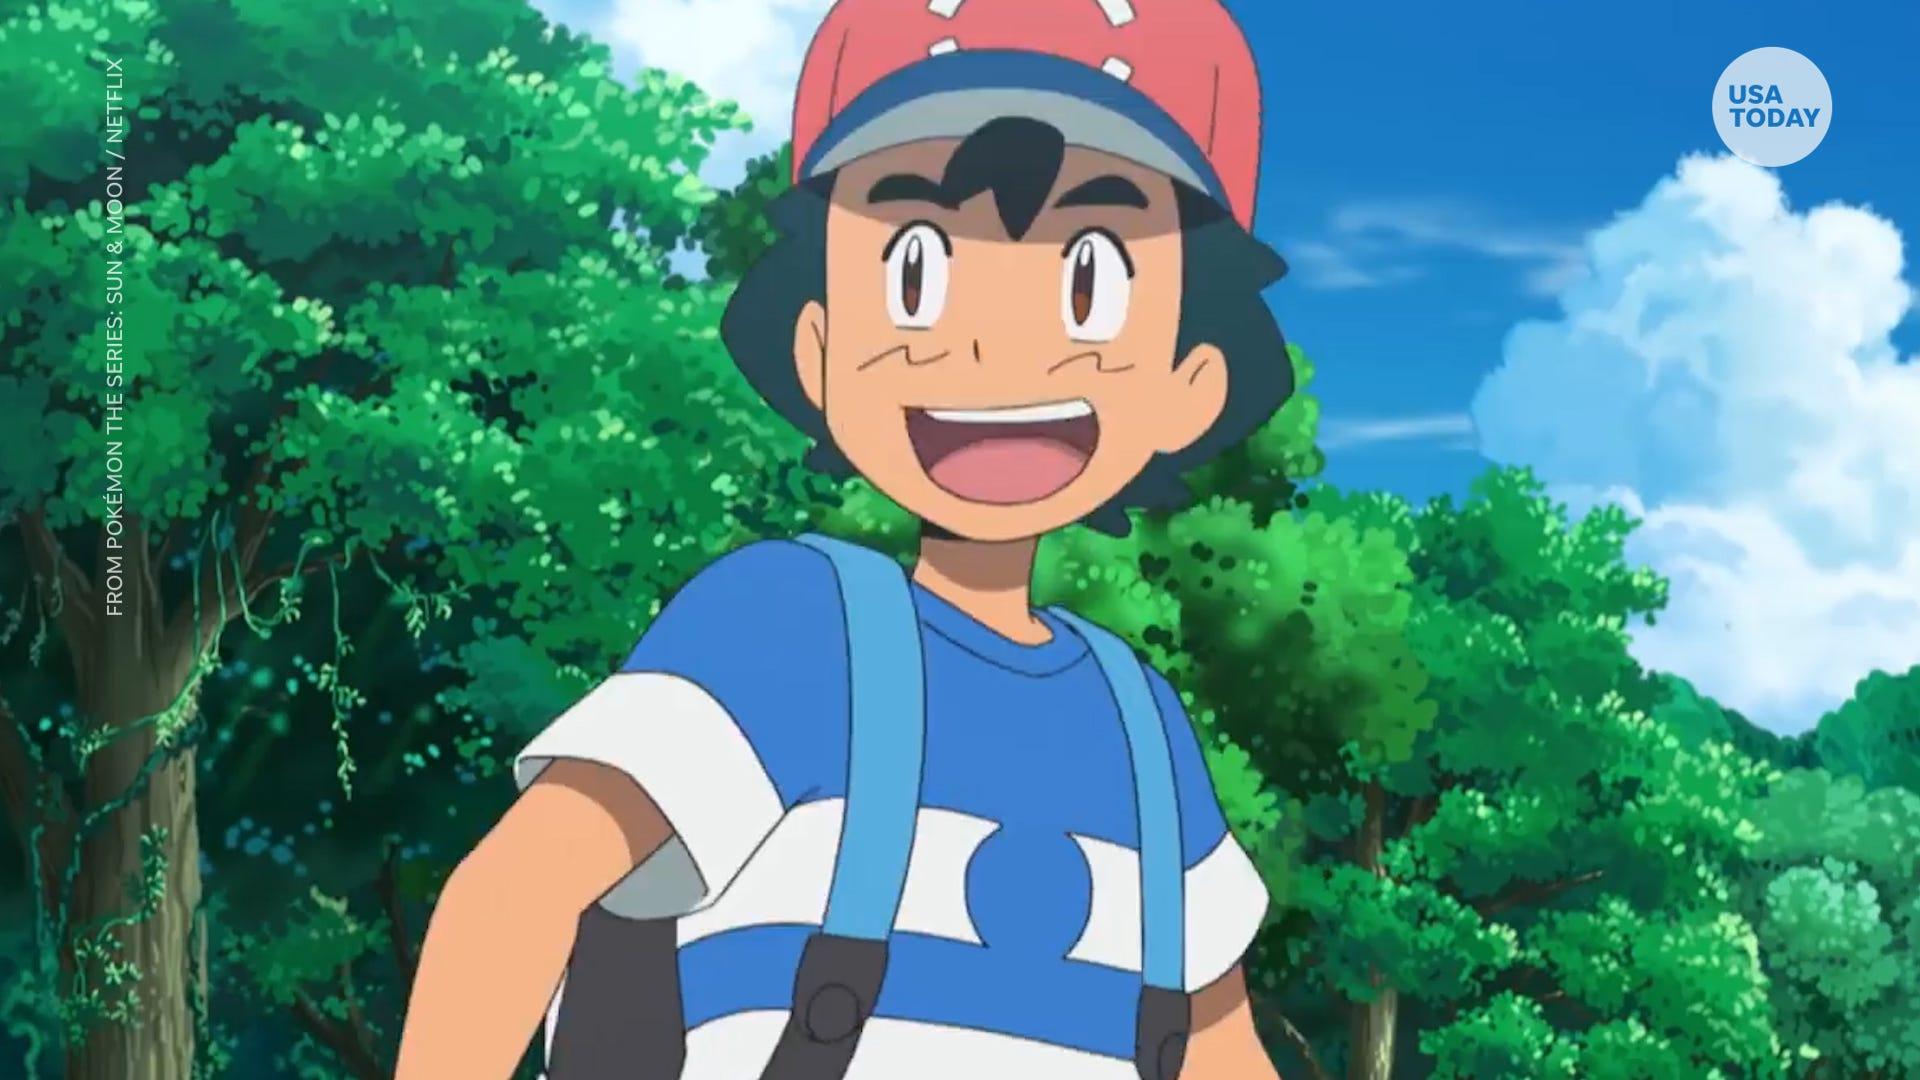 Pokémon player Regan Retzloff of Cape Coral is No  1 in the